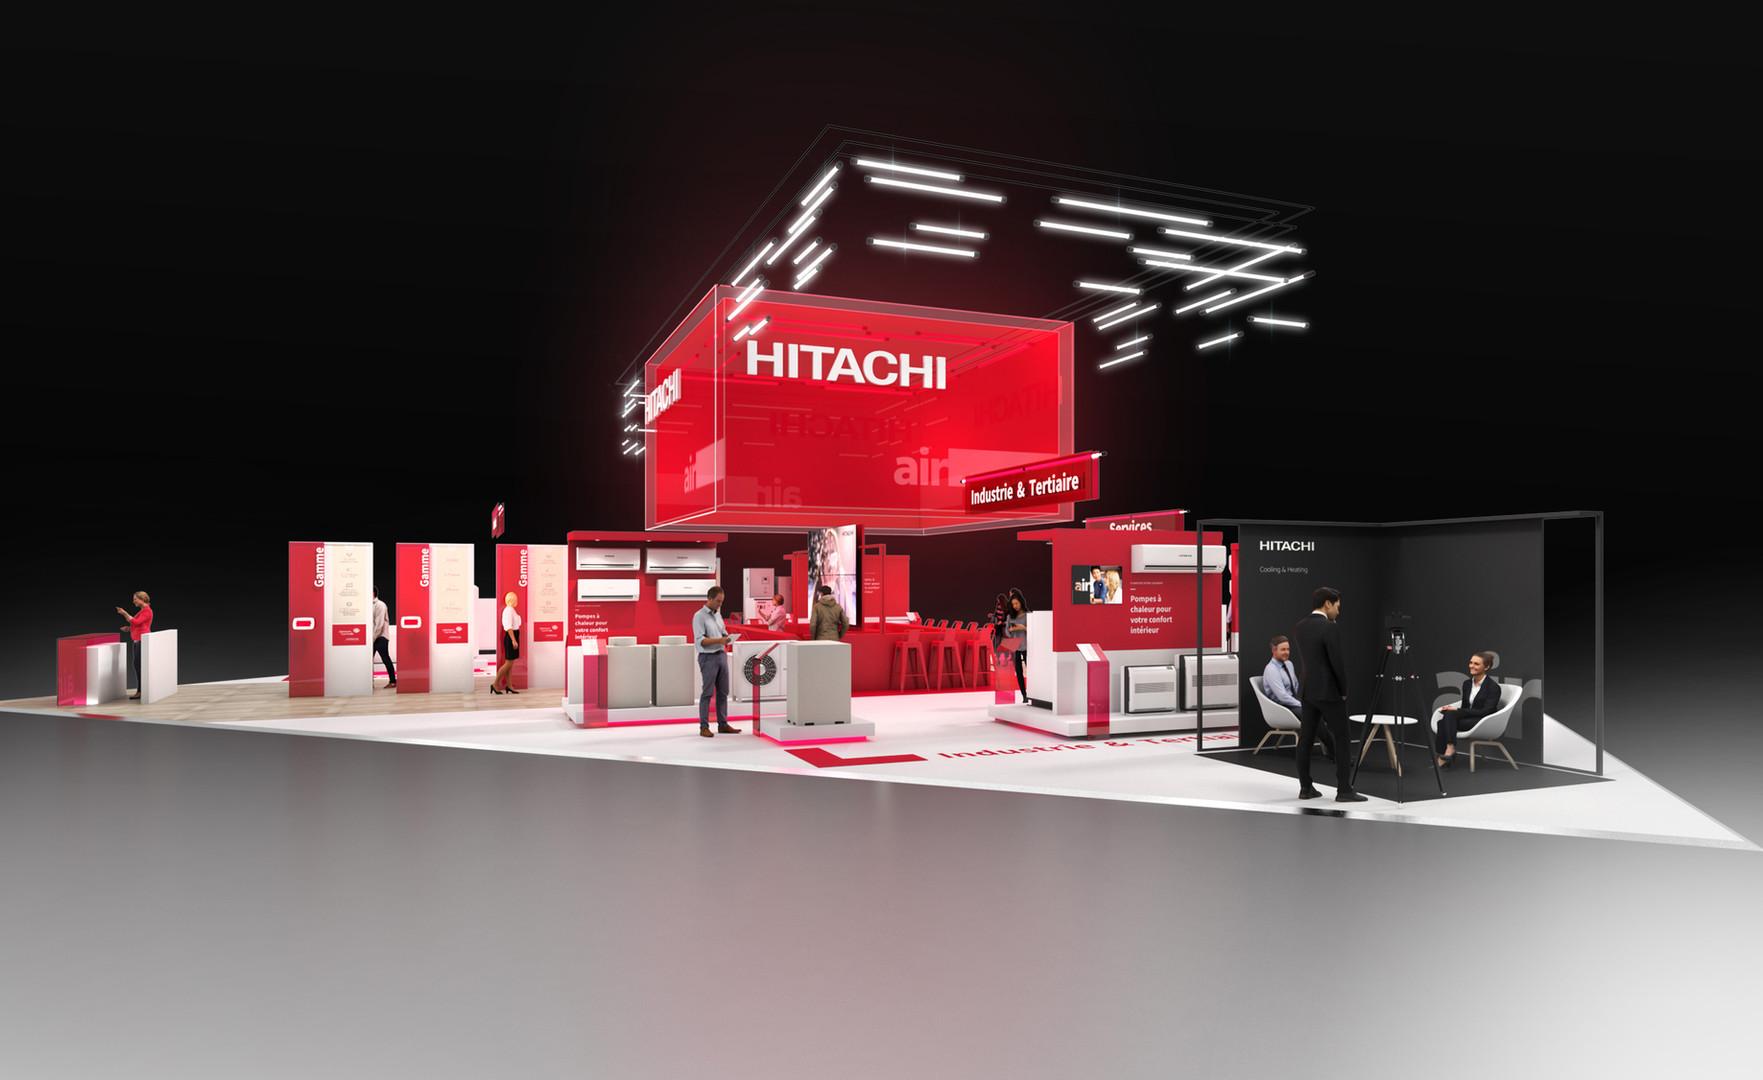 HITACHI - INTERCLIMA 2019 - VUE GENERALE